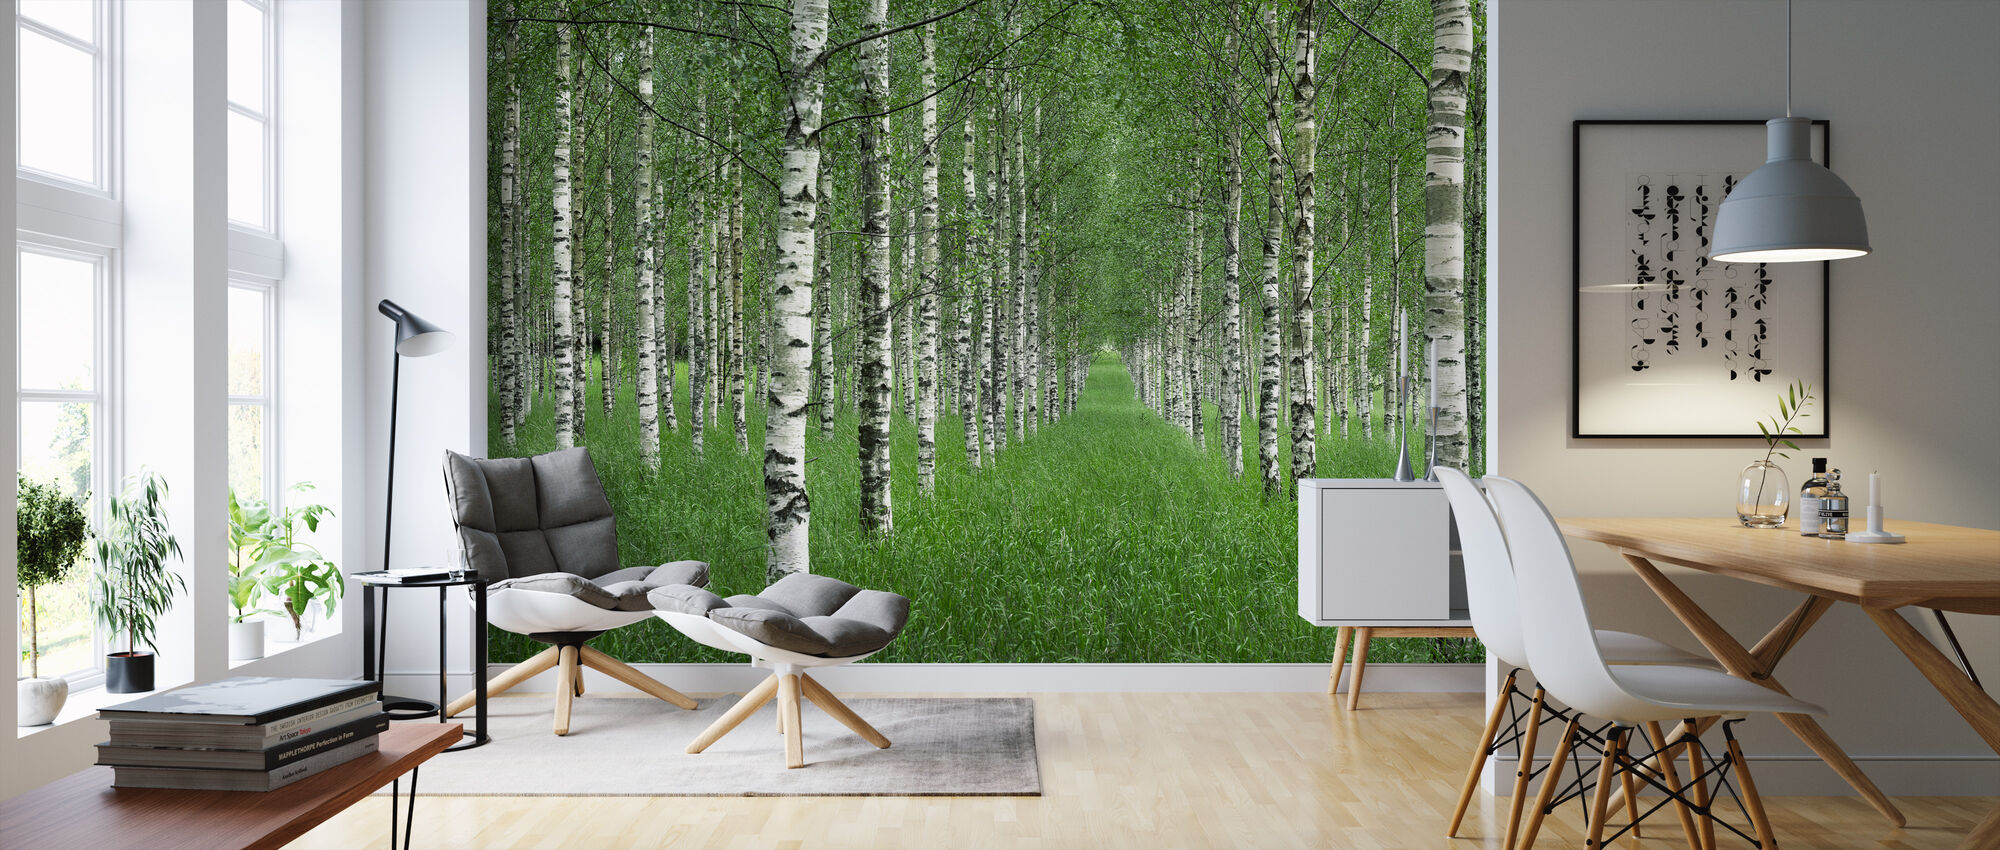 Tunnel - Wallpaper - Living Room